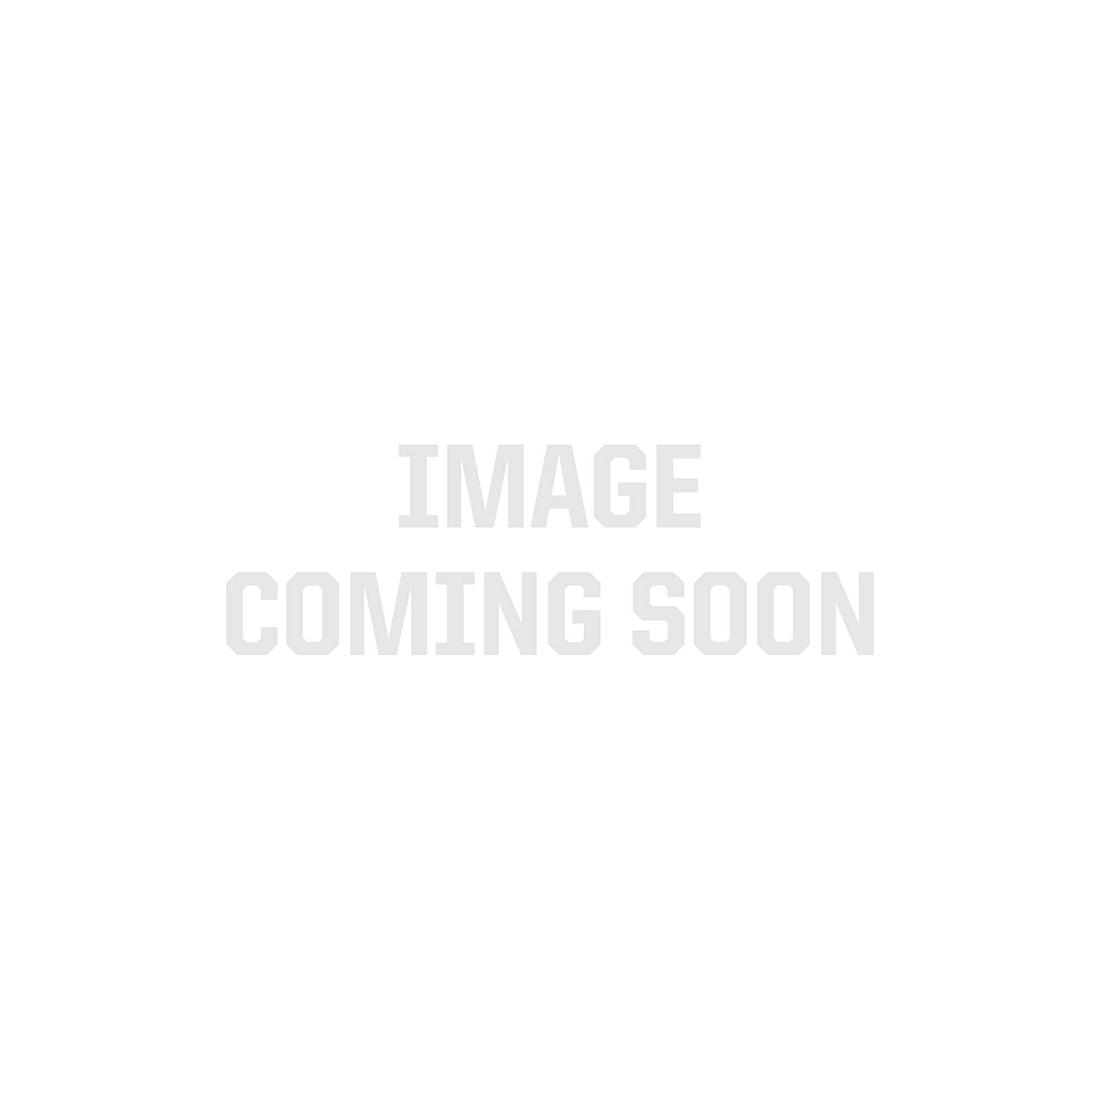 EL ULT20 Ultra Thin Aluminum Channel (Anodized)